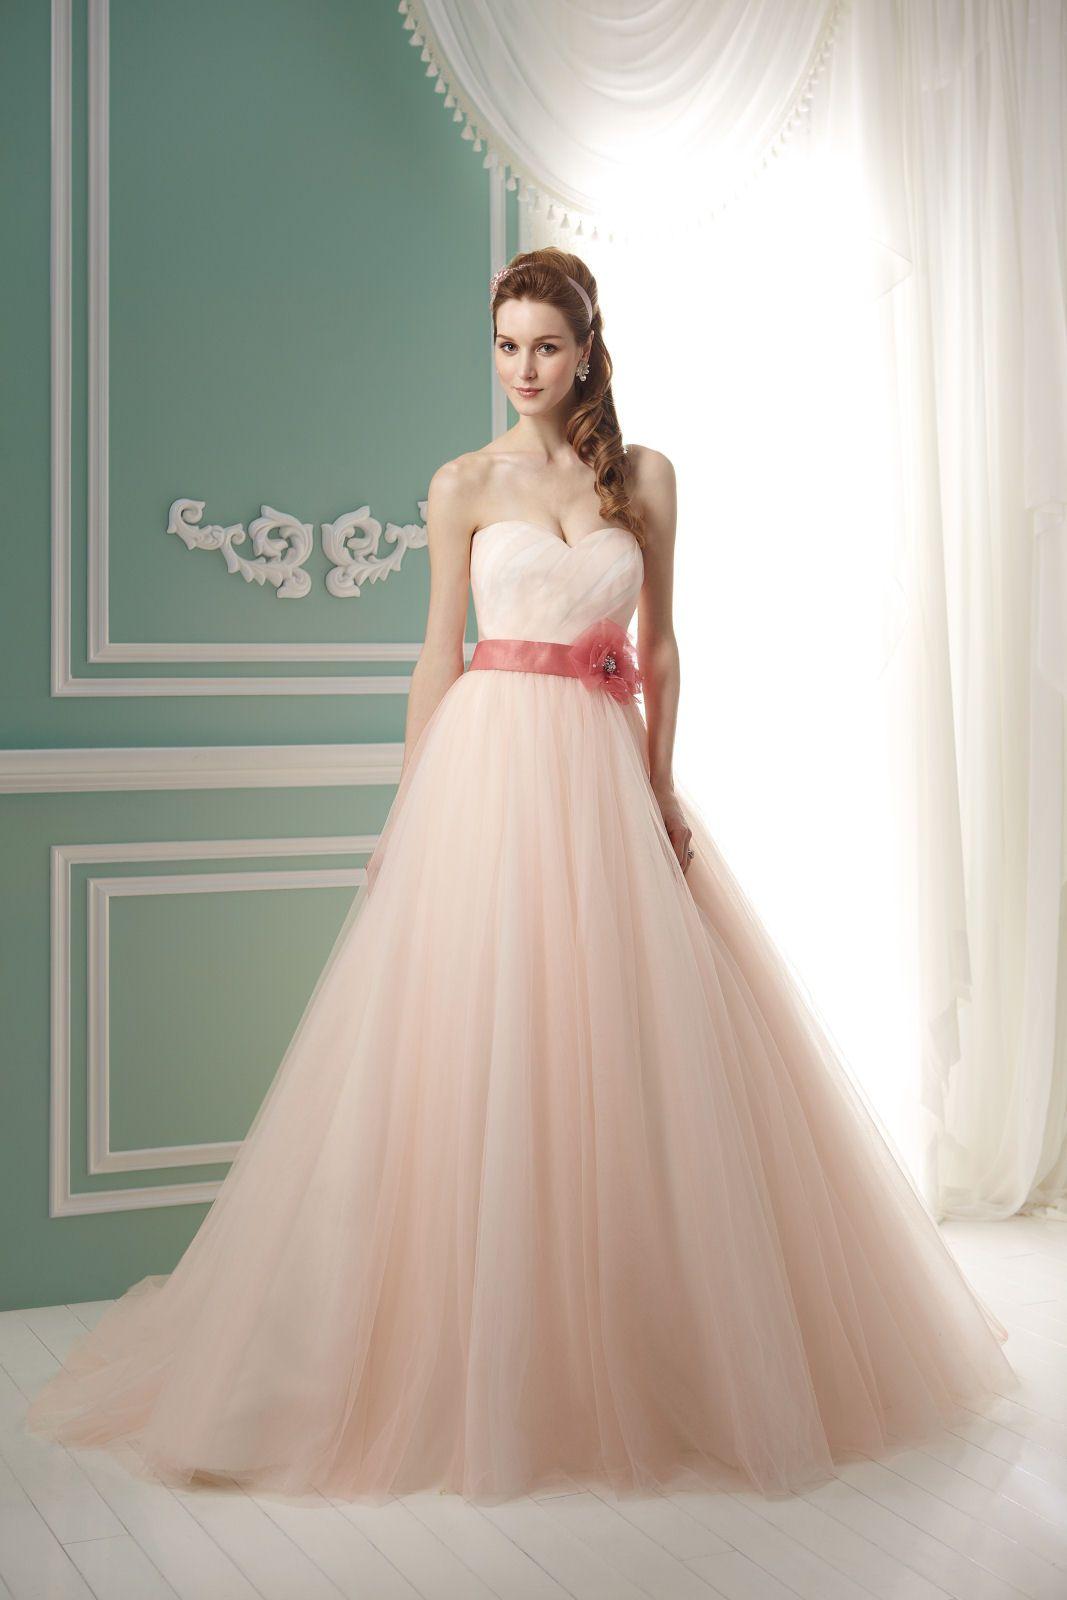 blush wedding dress, minus the belt/sash